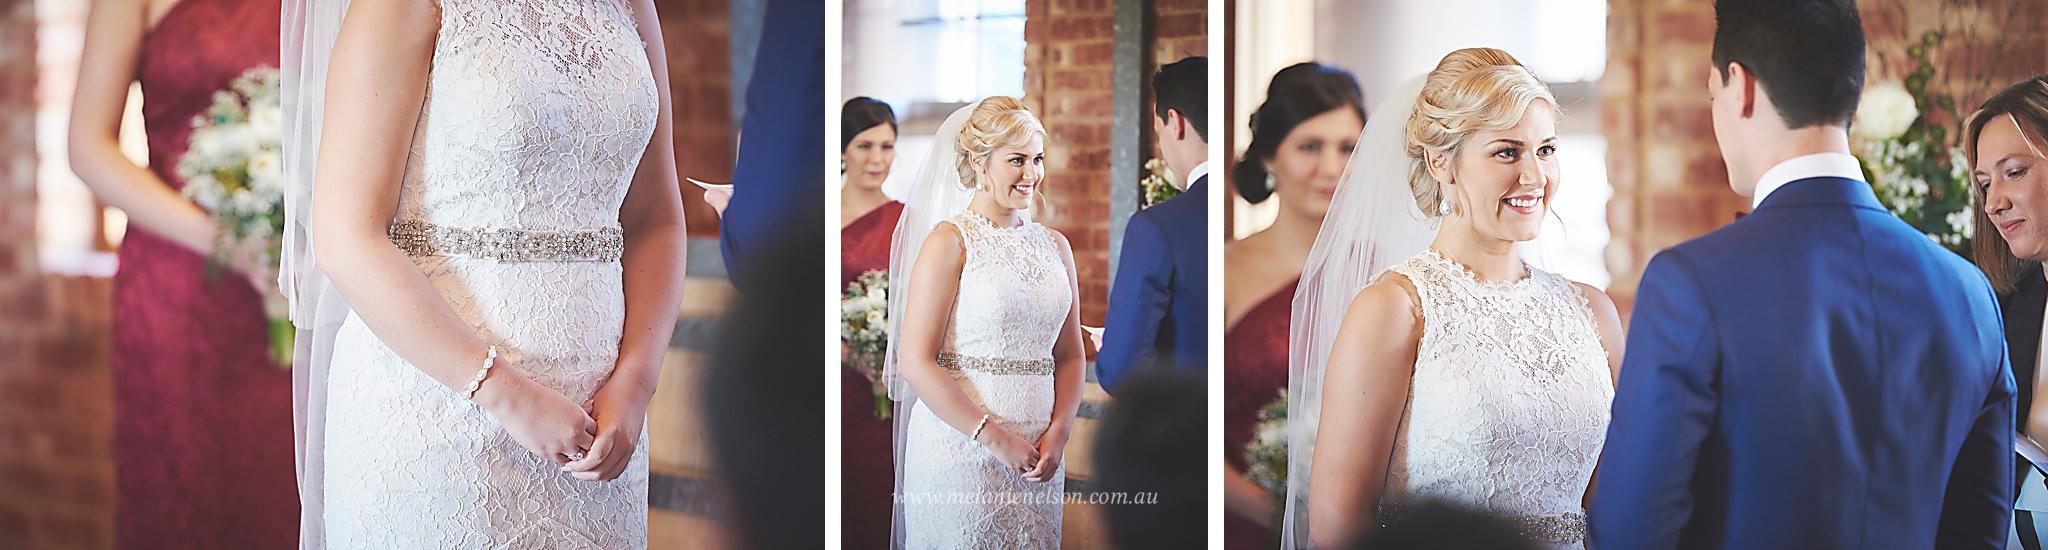 barossa_wedding_photography_0014.jpg